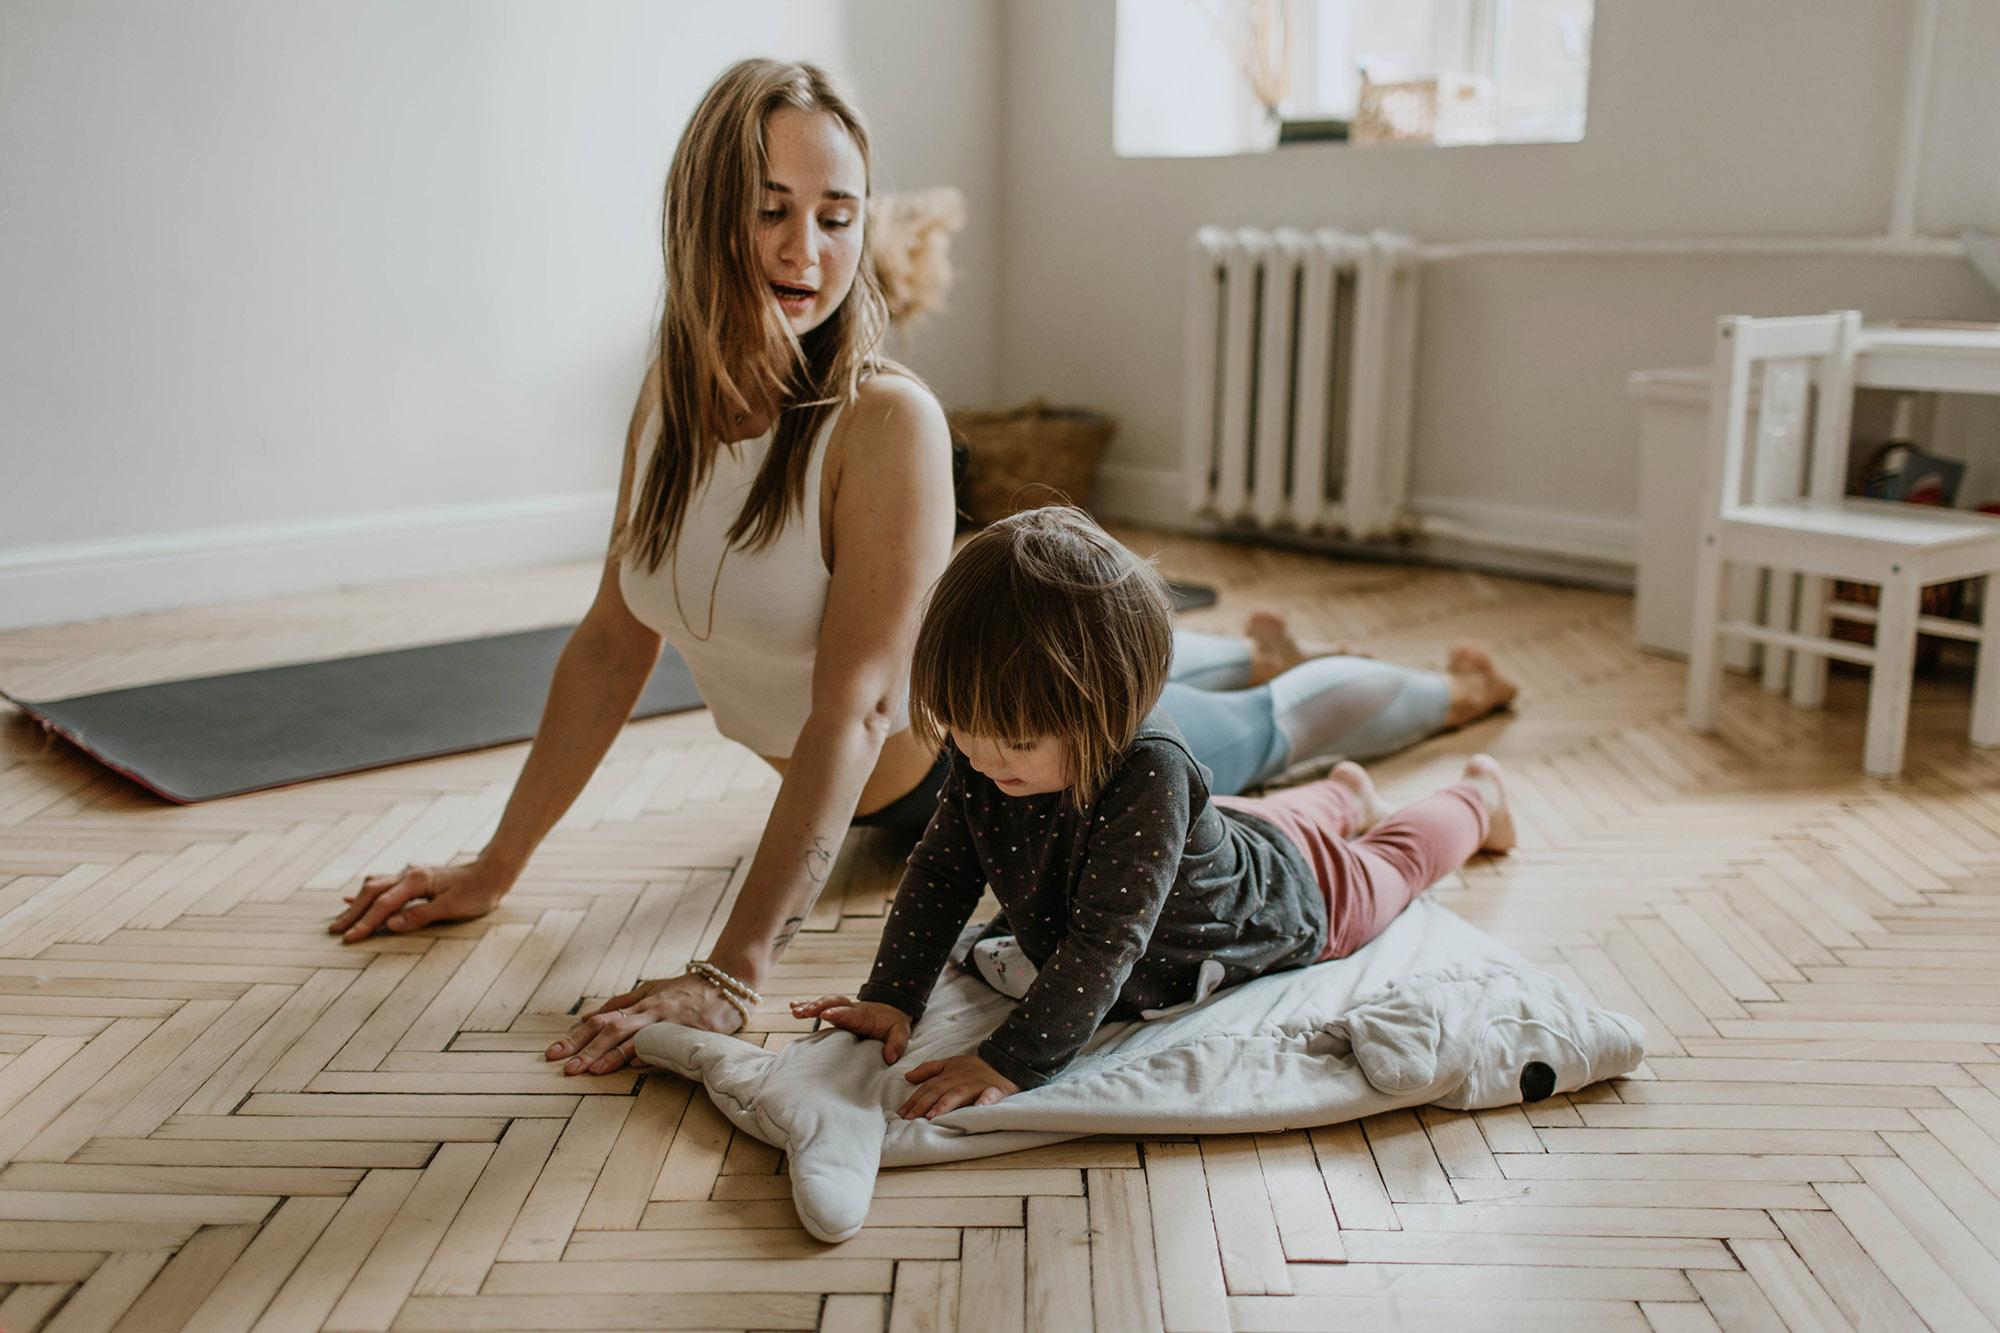 isolation activities for children, yoga